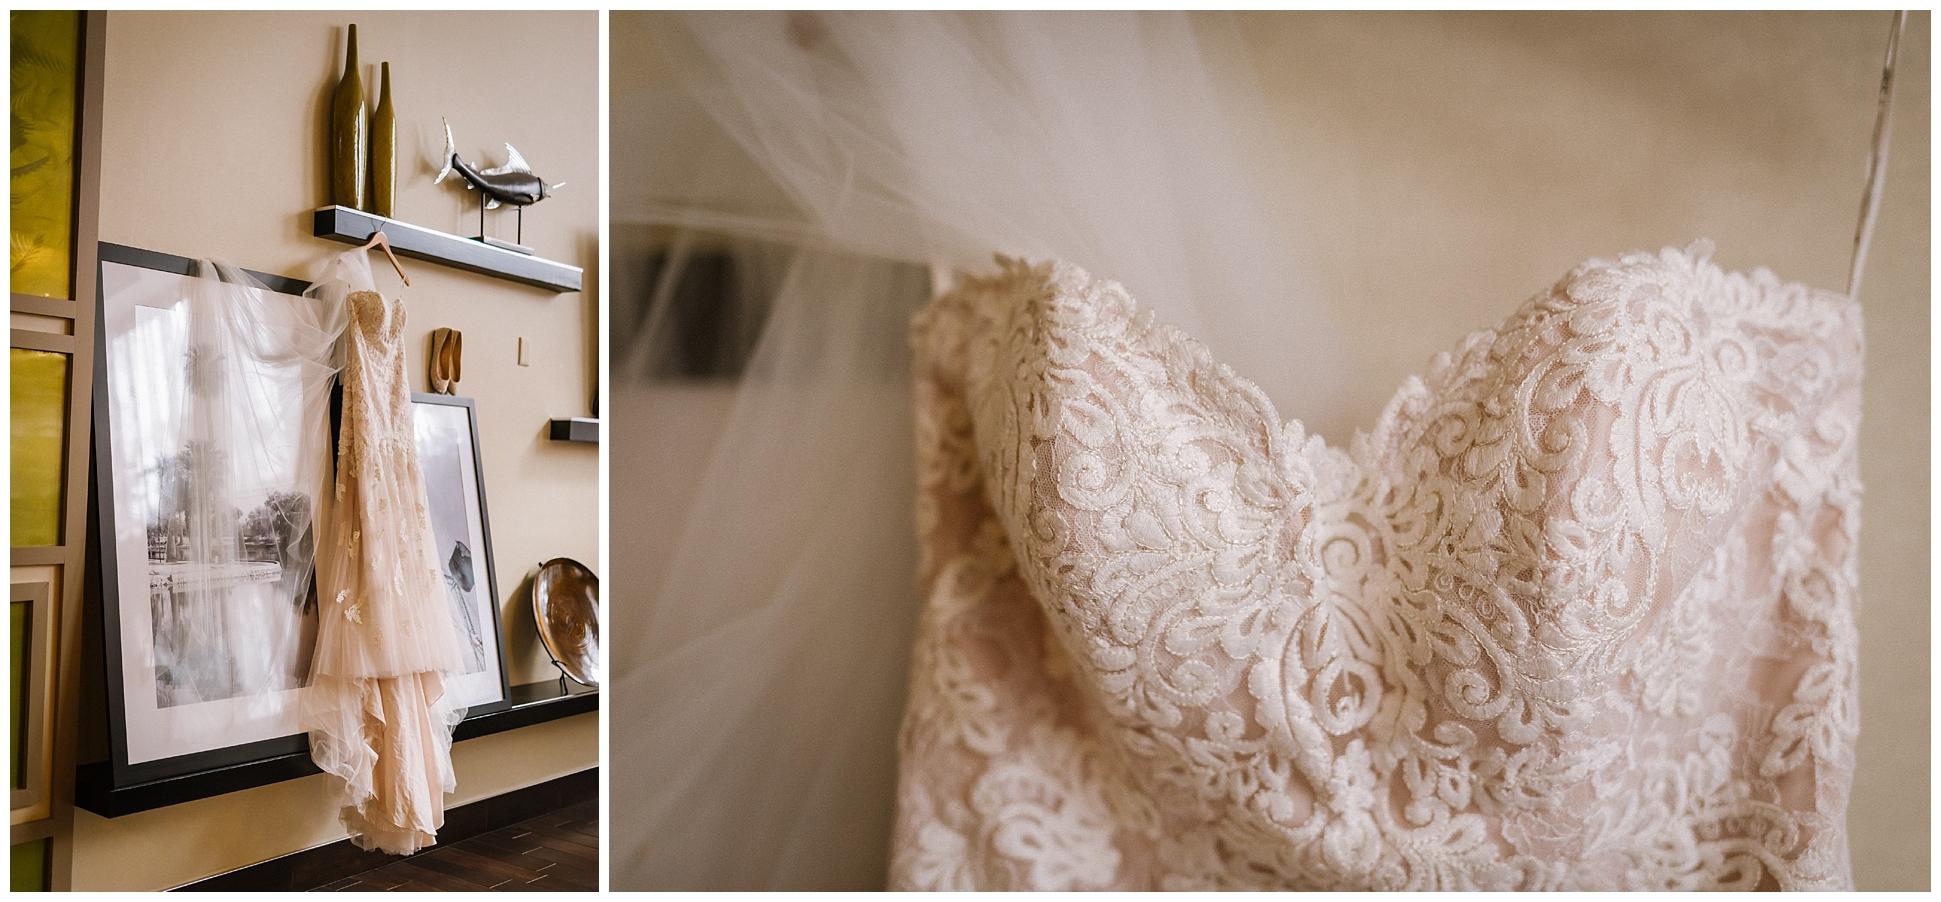 St-pete-wedding-photography-unique-glass-blowing-gallery-succulent-art_0001.jpg